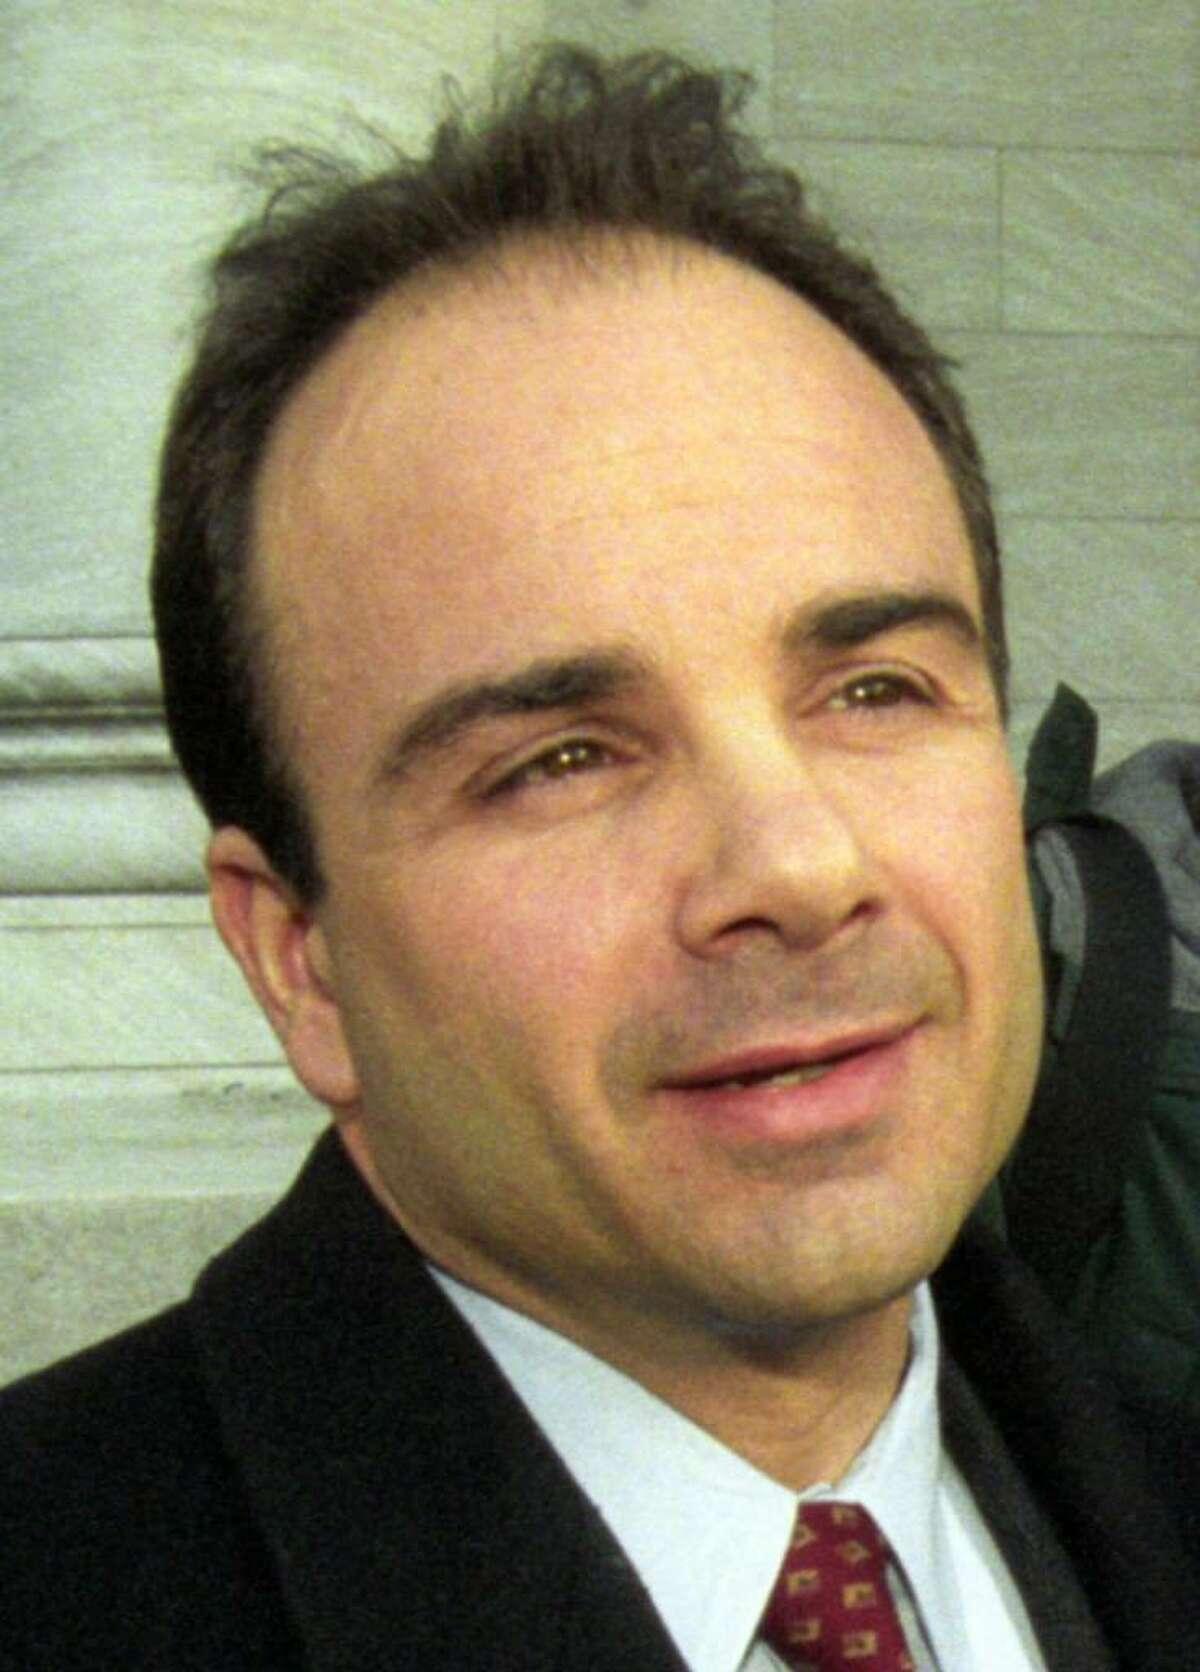 Former Bridgeport Mayor Joseph Ganim has been relaesed from prison to a halfway house.